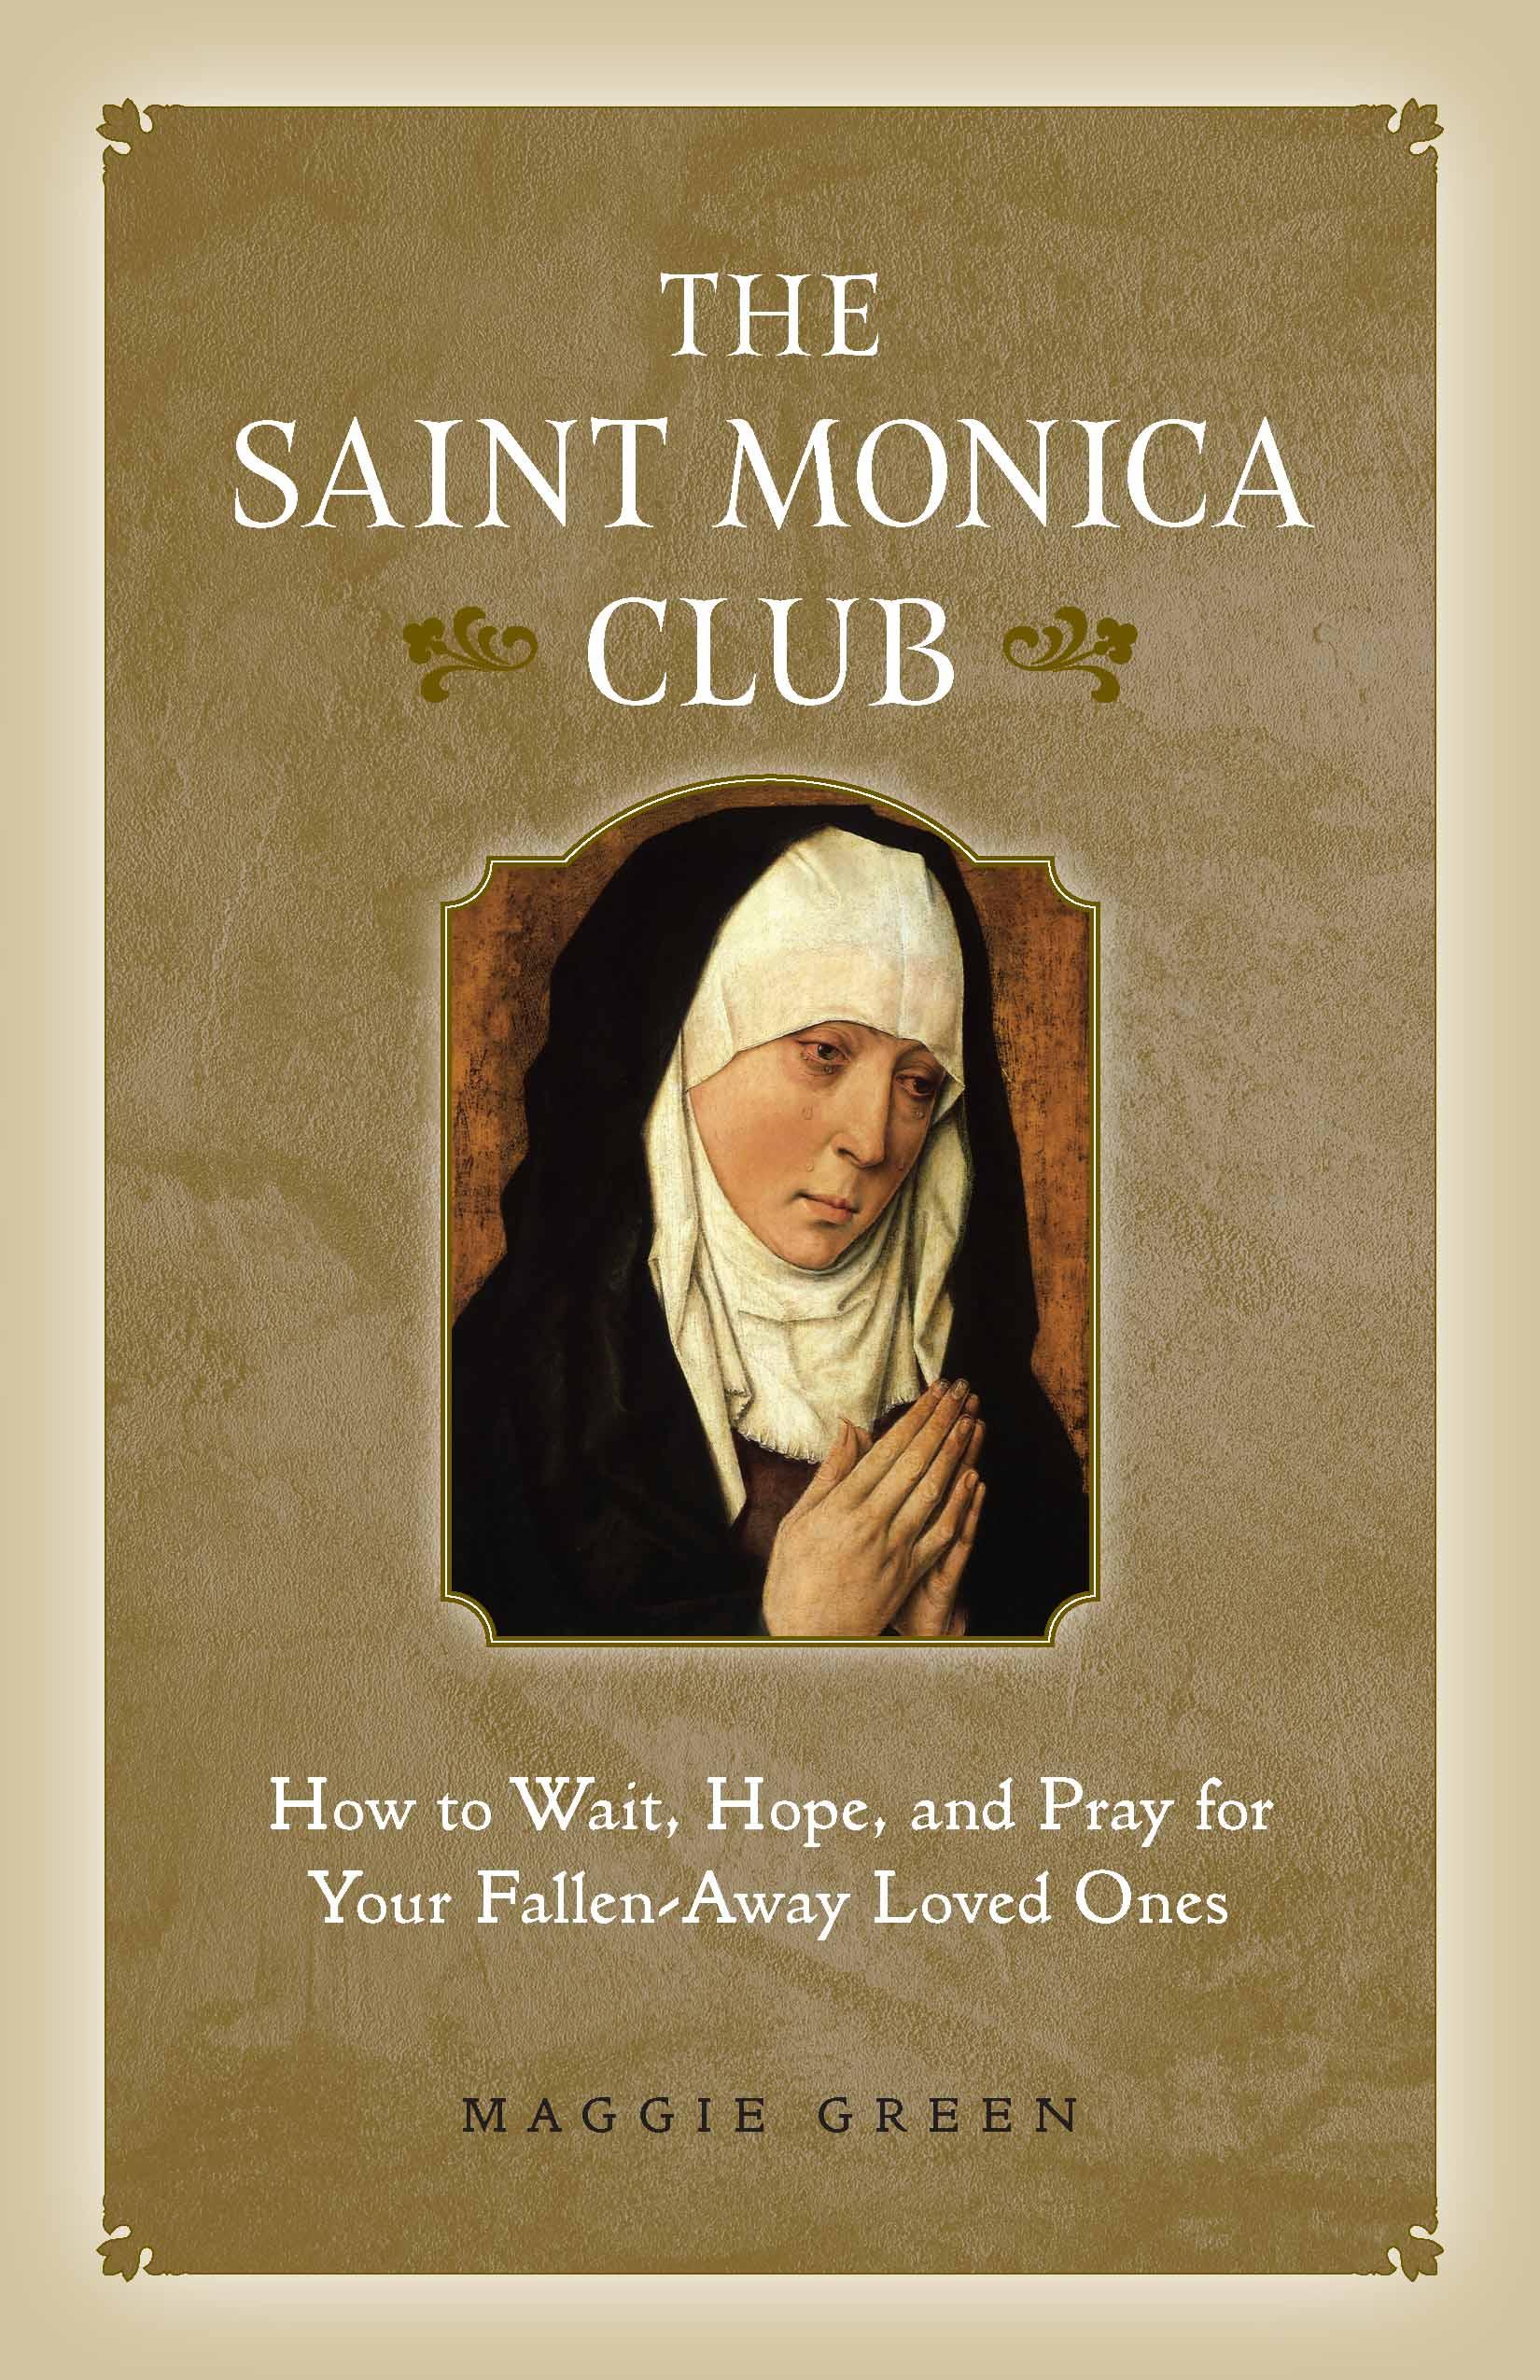 Saint Monica Club